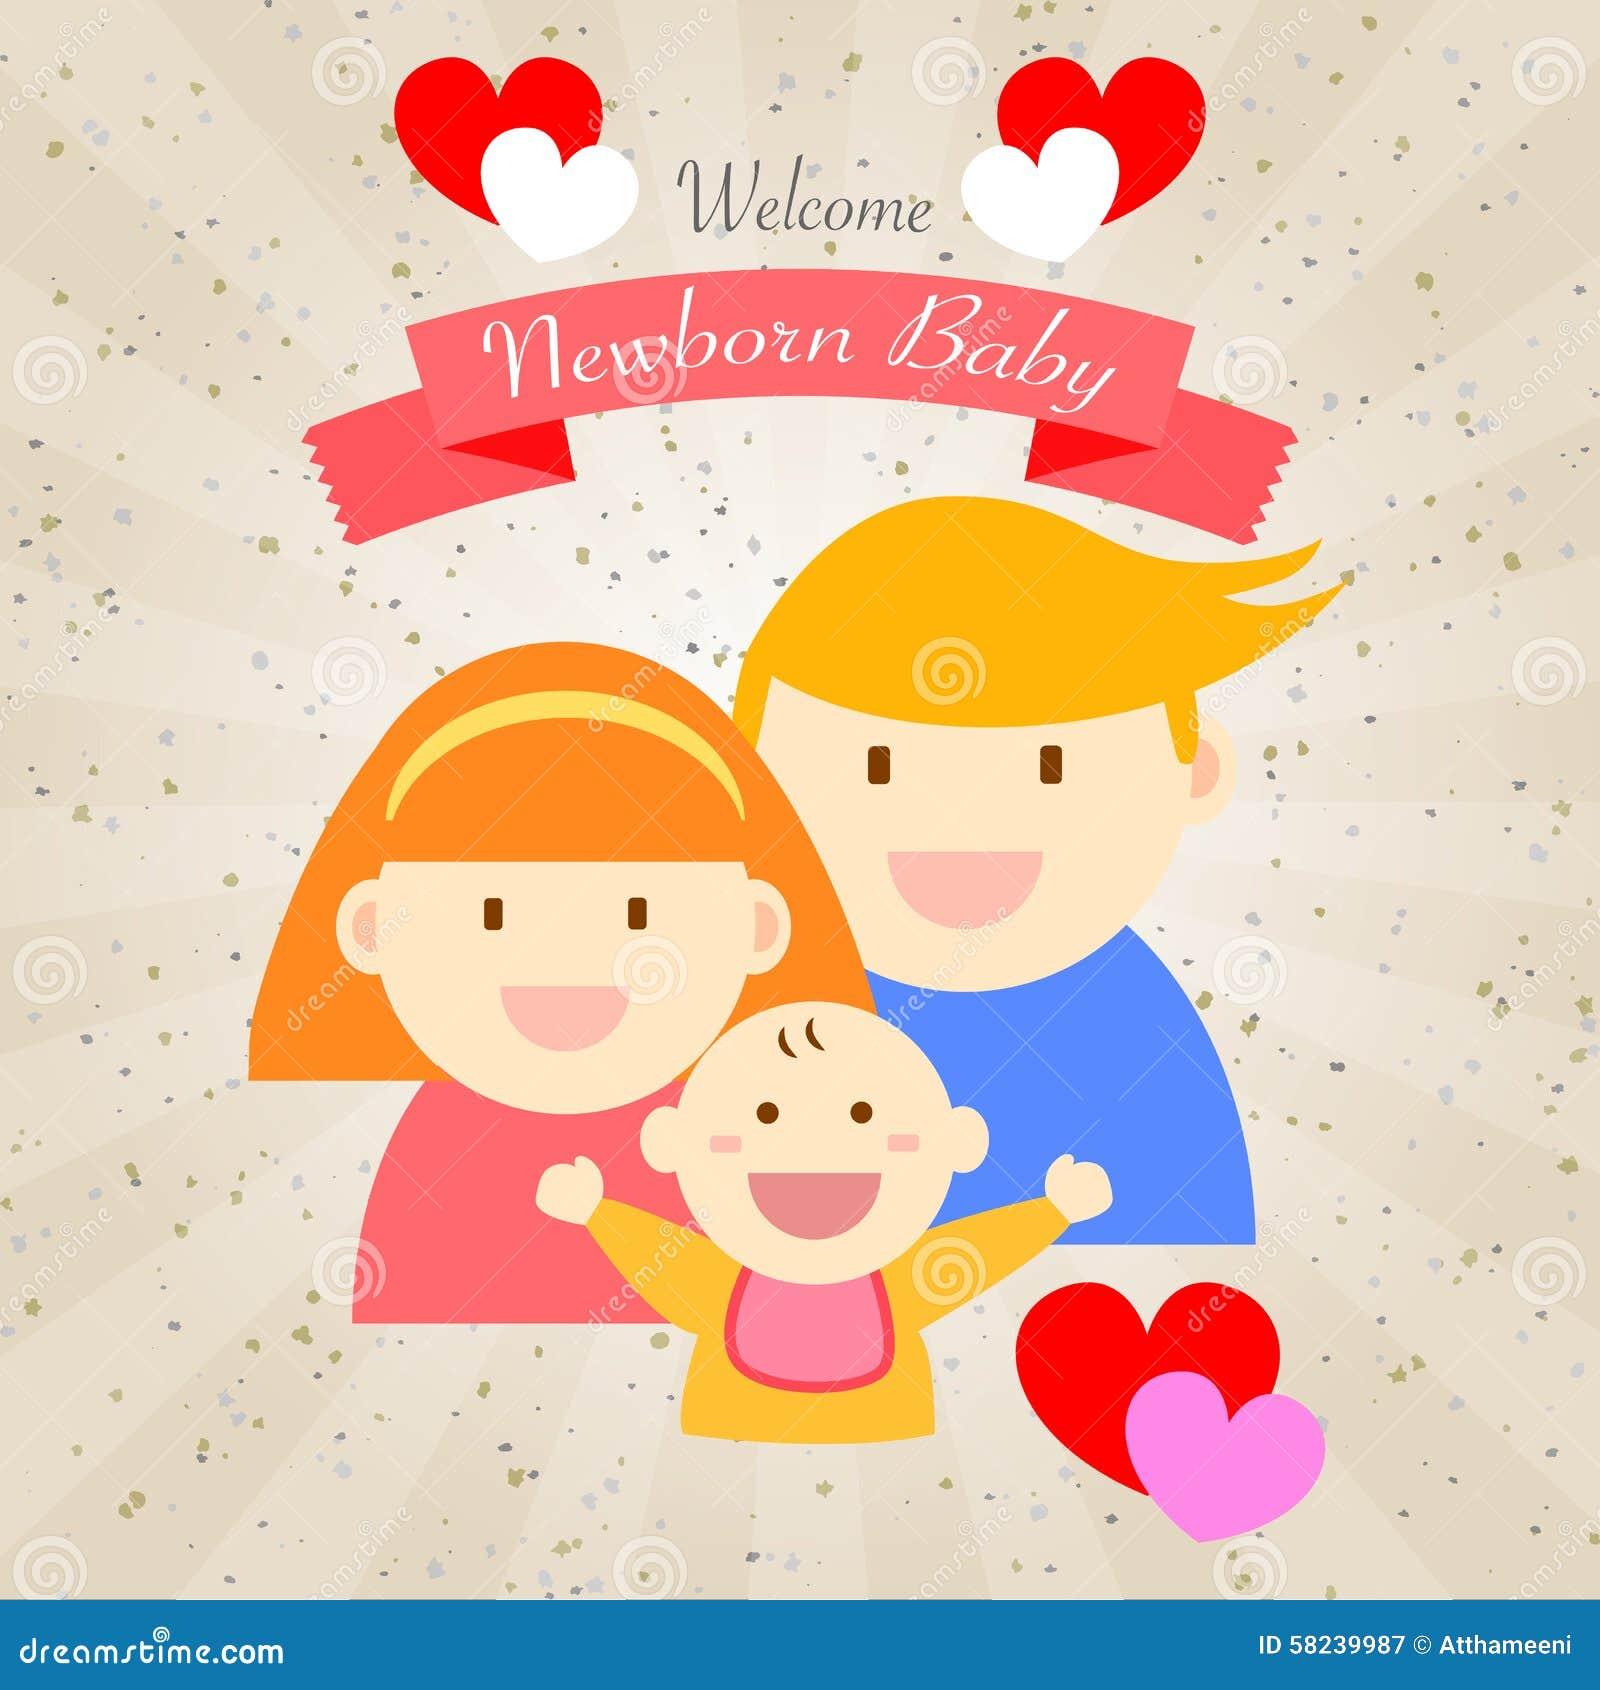 welcome newborn baby happy family stock illustration